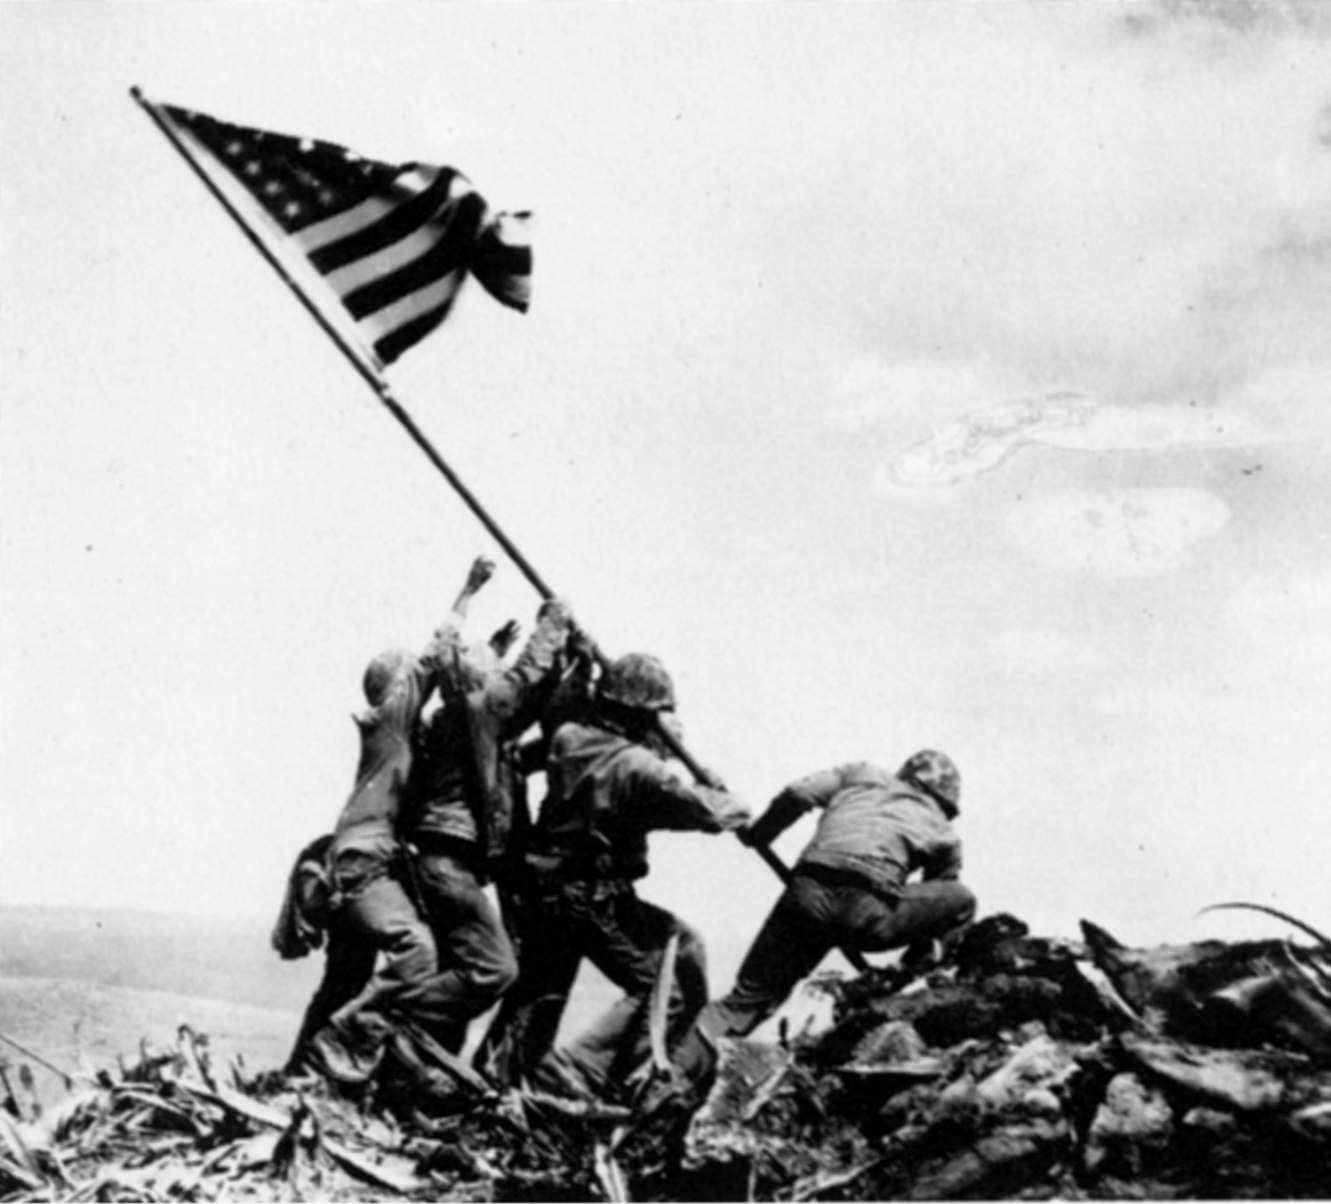 Joseph J. Rosenthal /1911-2006/: Raising the Flag on Iwo Jima, 1945